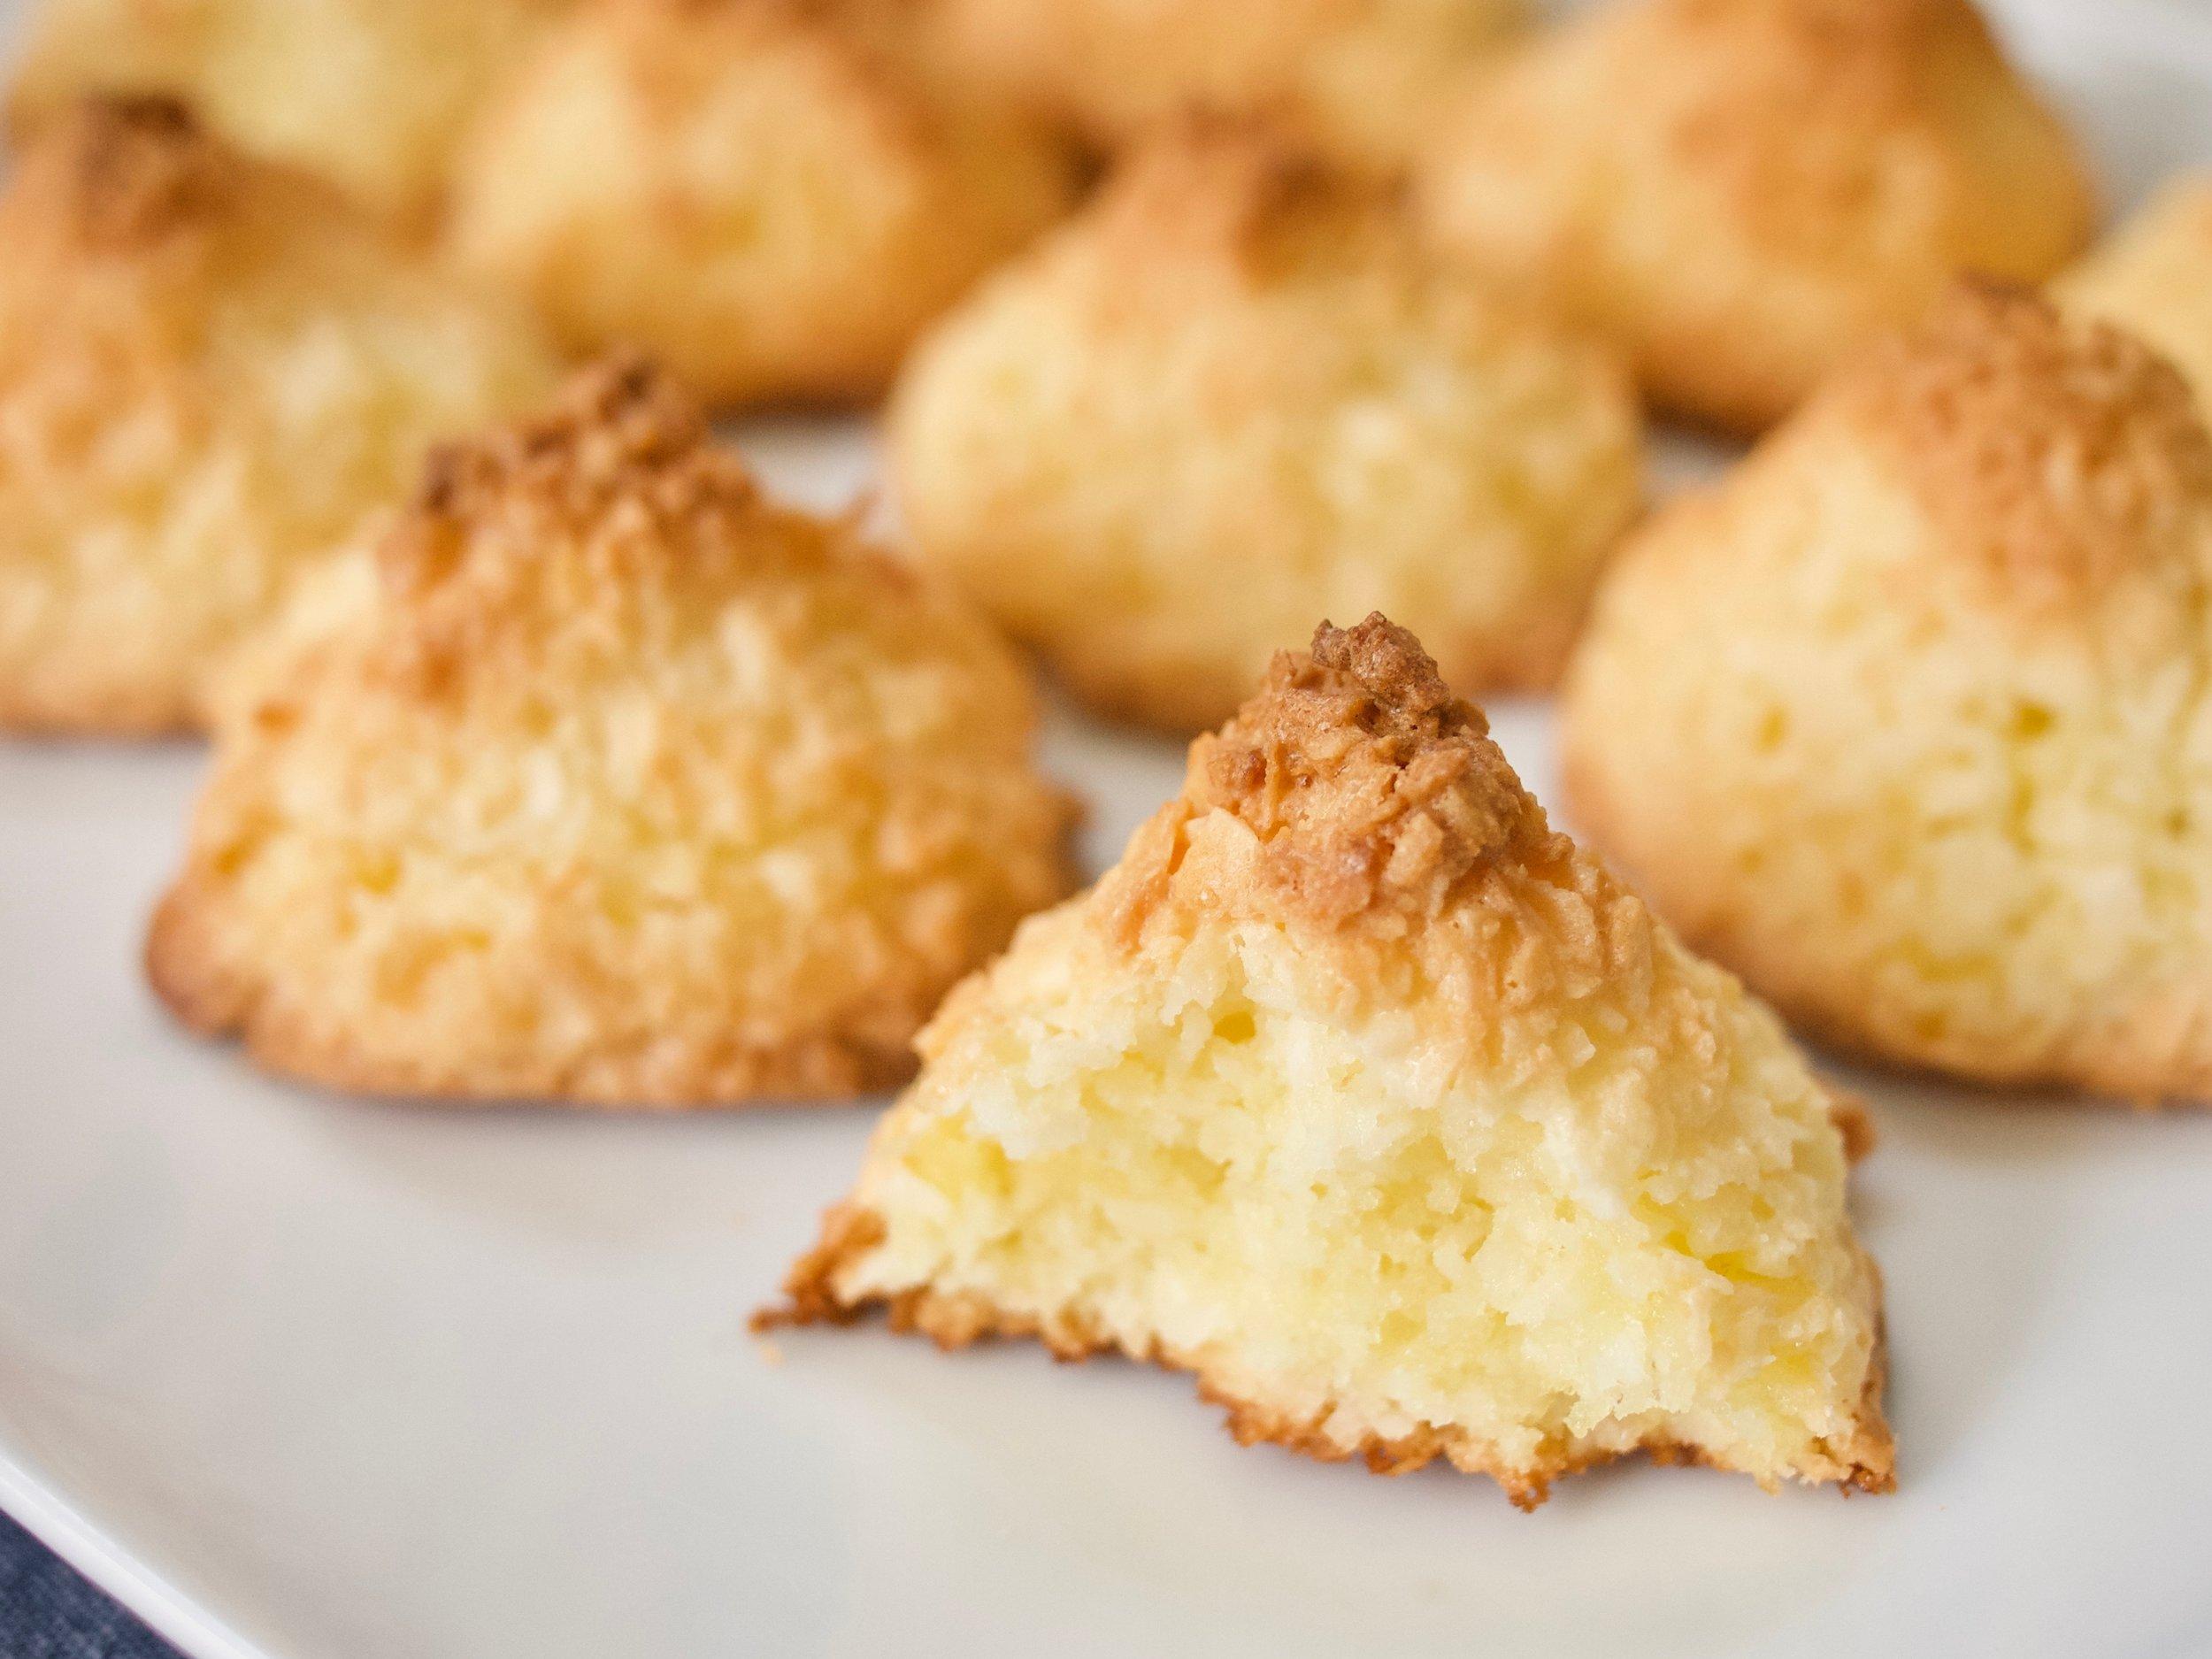 Coconut-Marzipan Macaroons